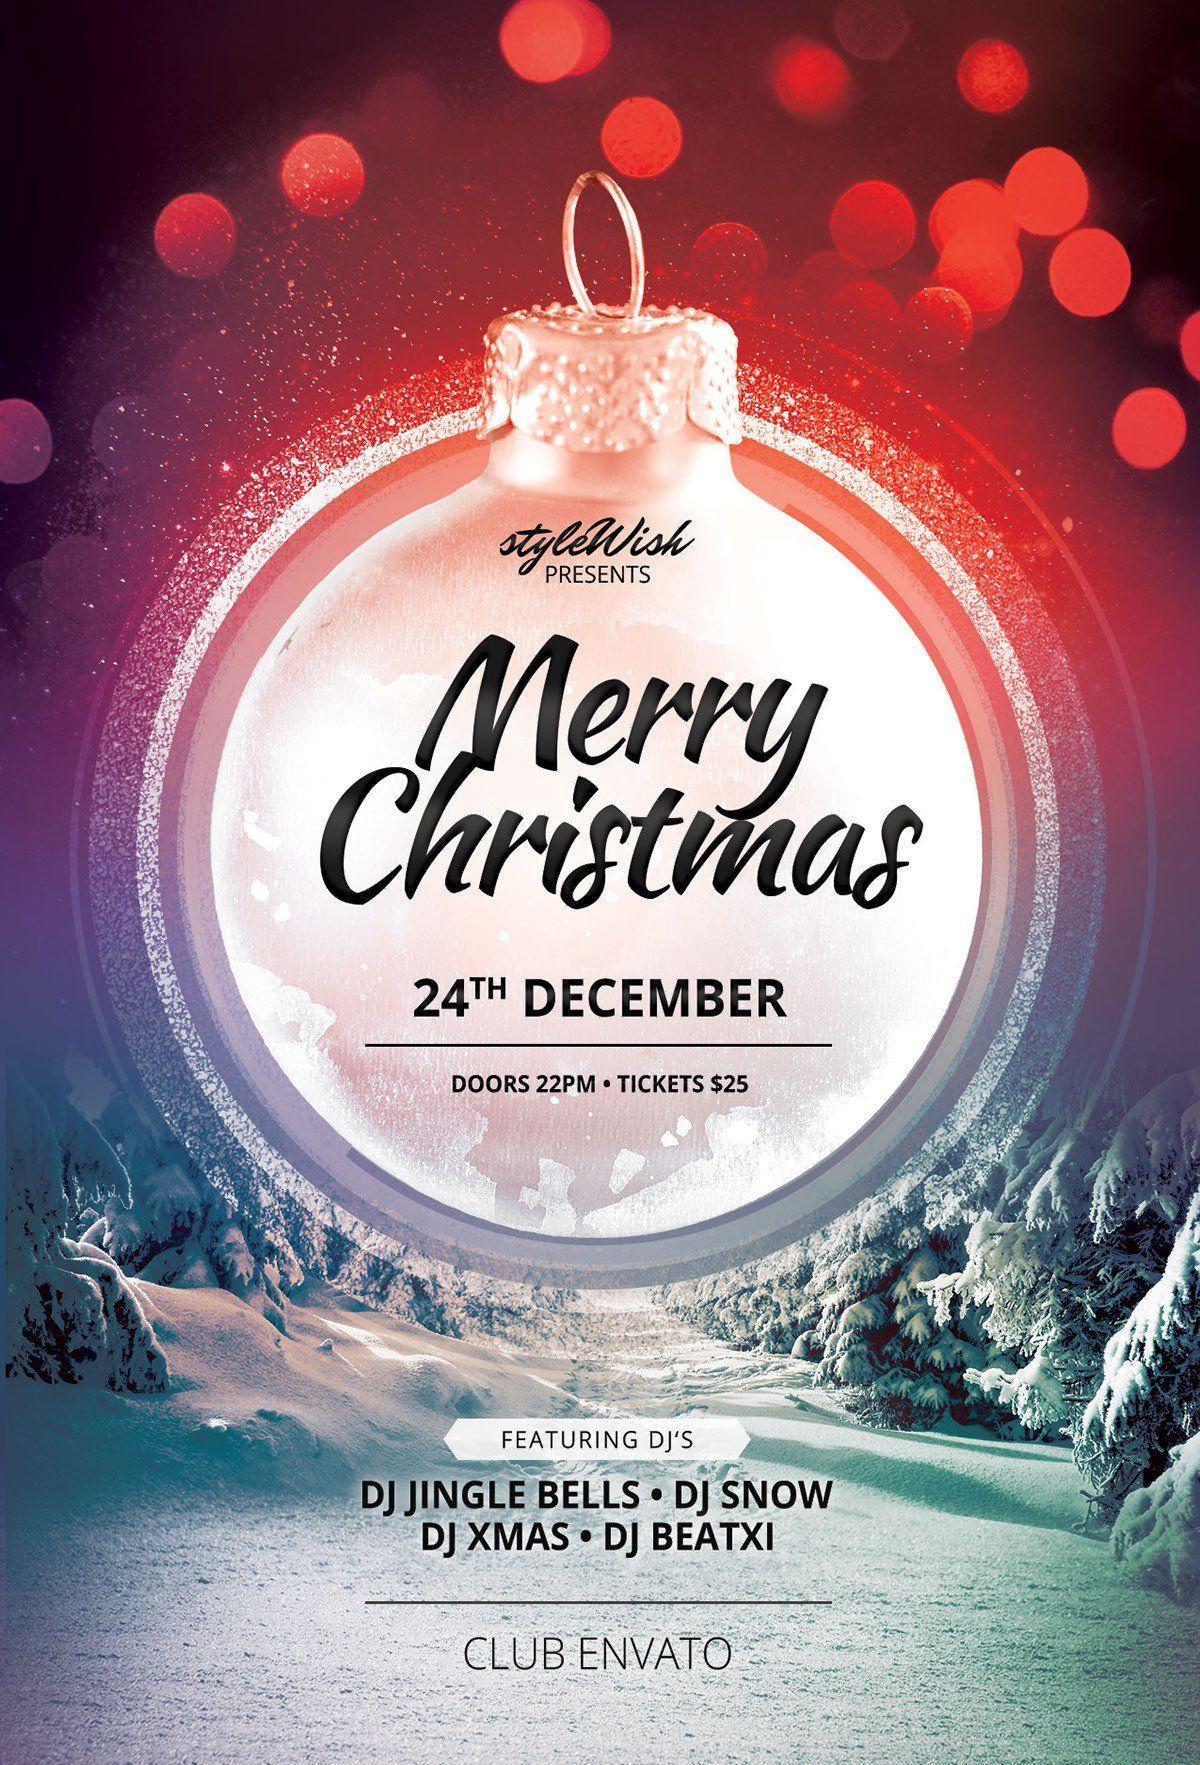 Christmas Flyer Template Merry Christmas Flyer Template On Behance In 2020 Christmas Flyer Template Christmas Poster Design Christmas Flyer